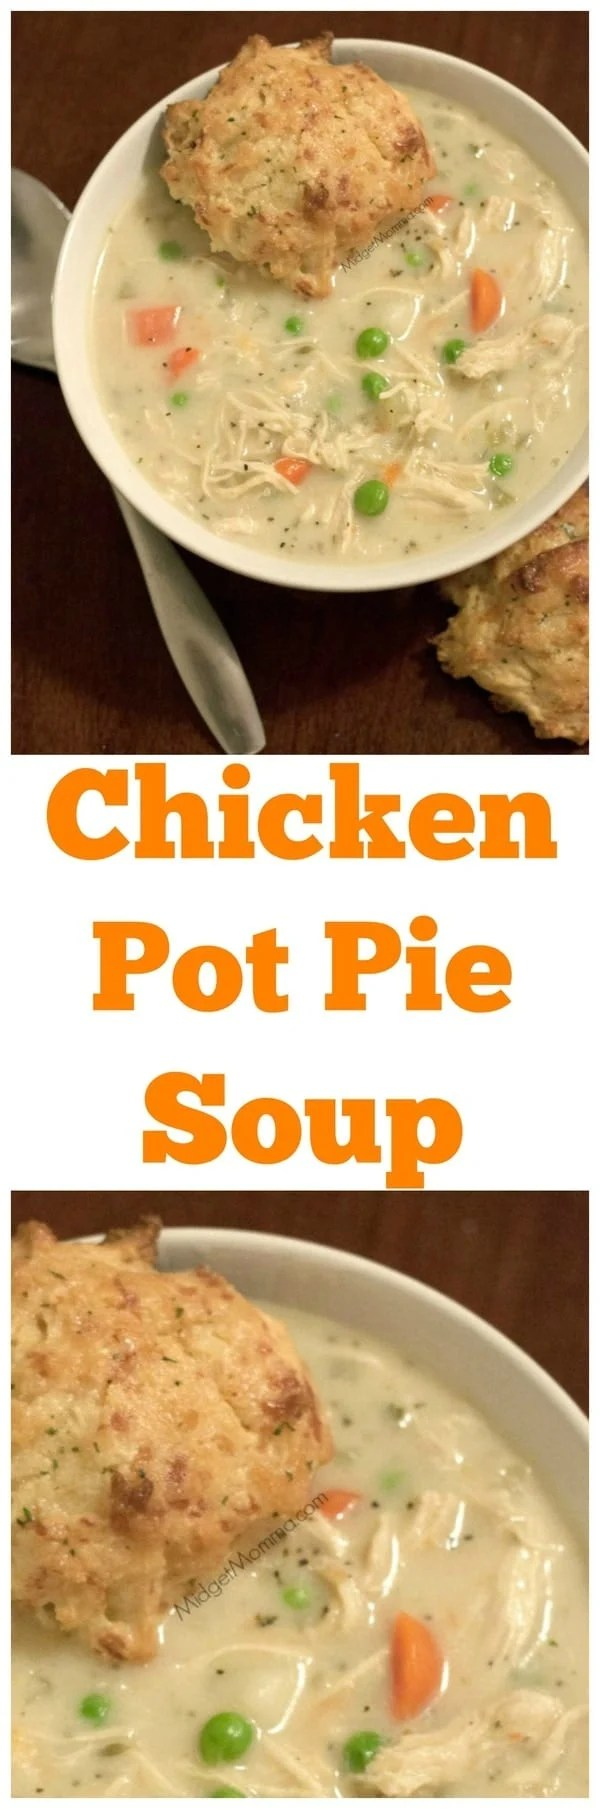 Chicken Pot Pie Soup  MidgetMomma